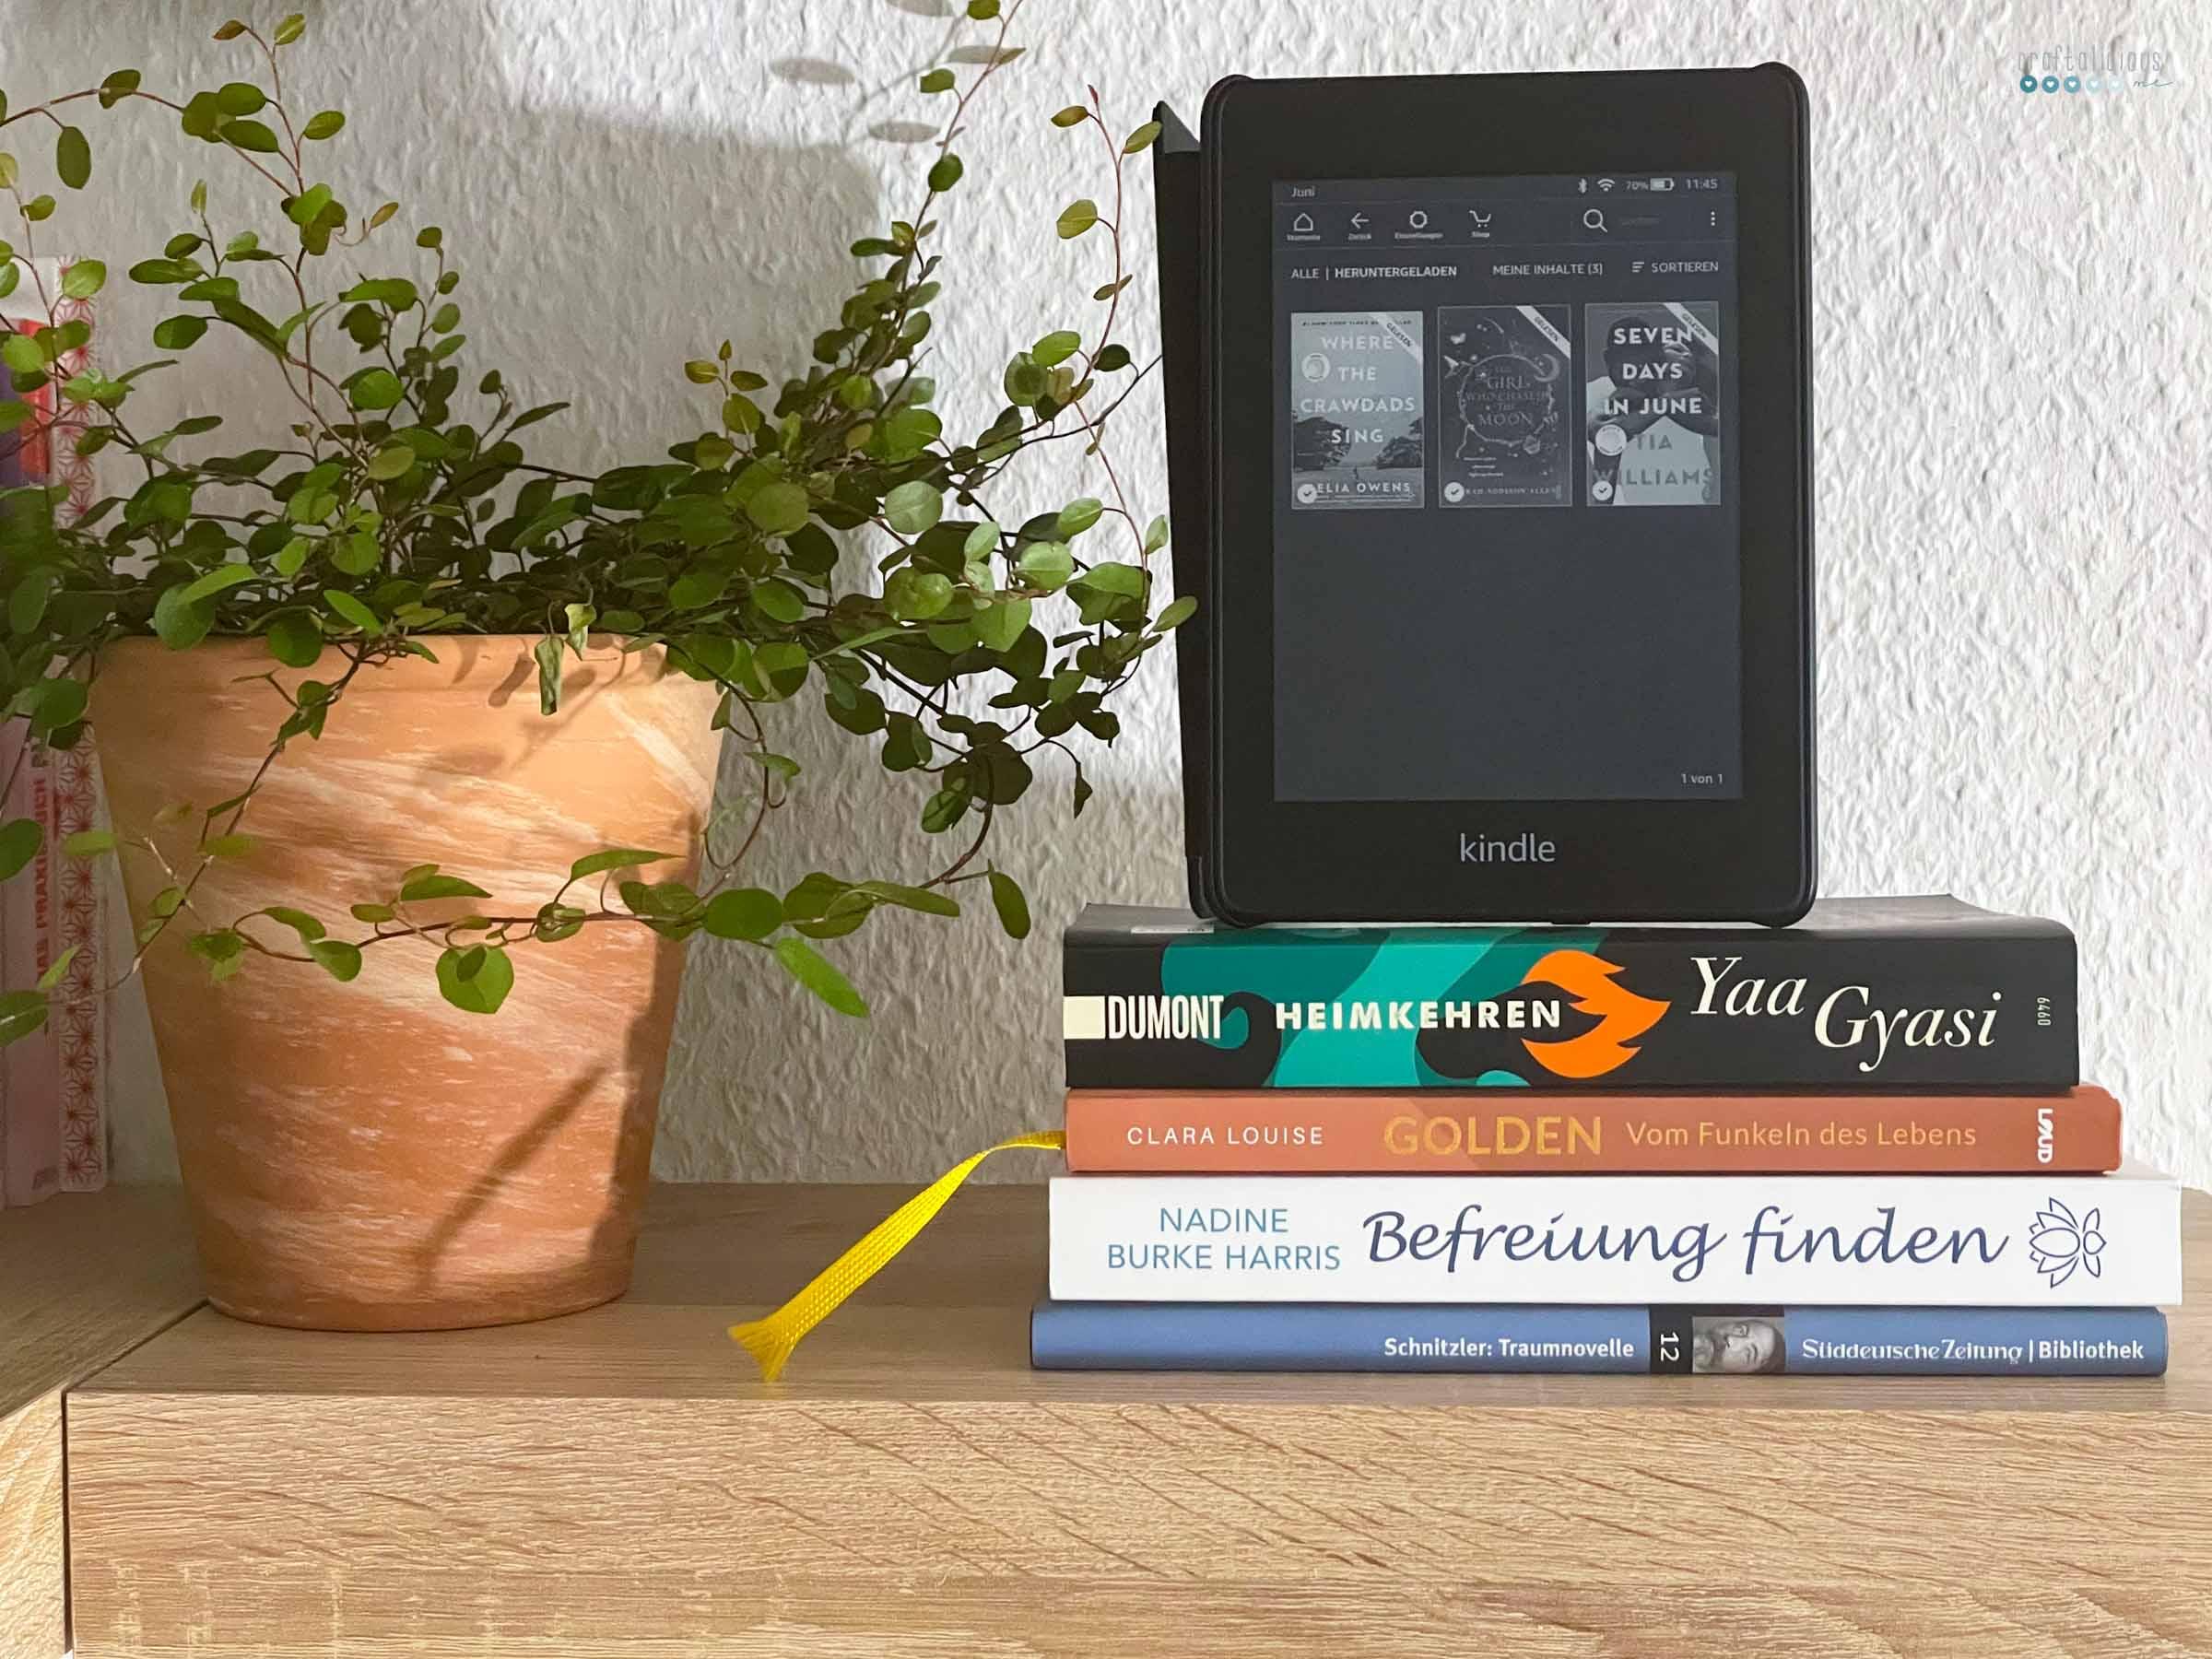 June books craftaliciousme seeking creative life